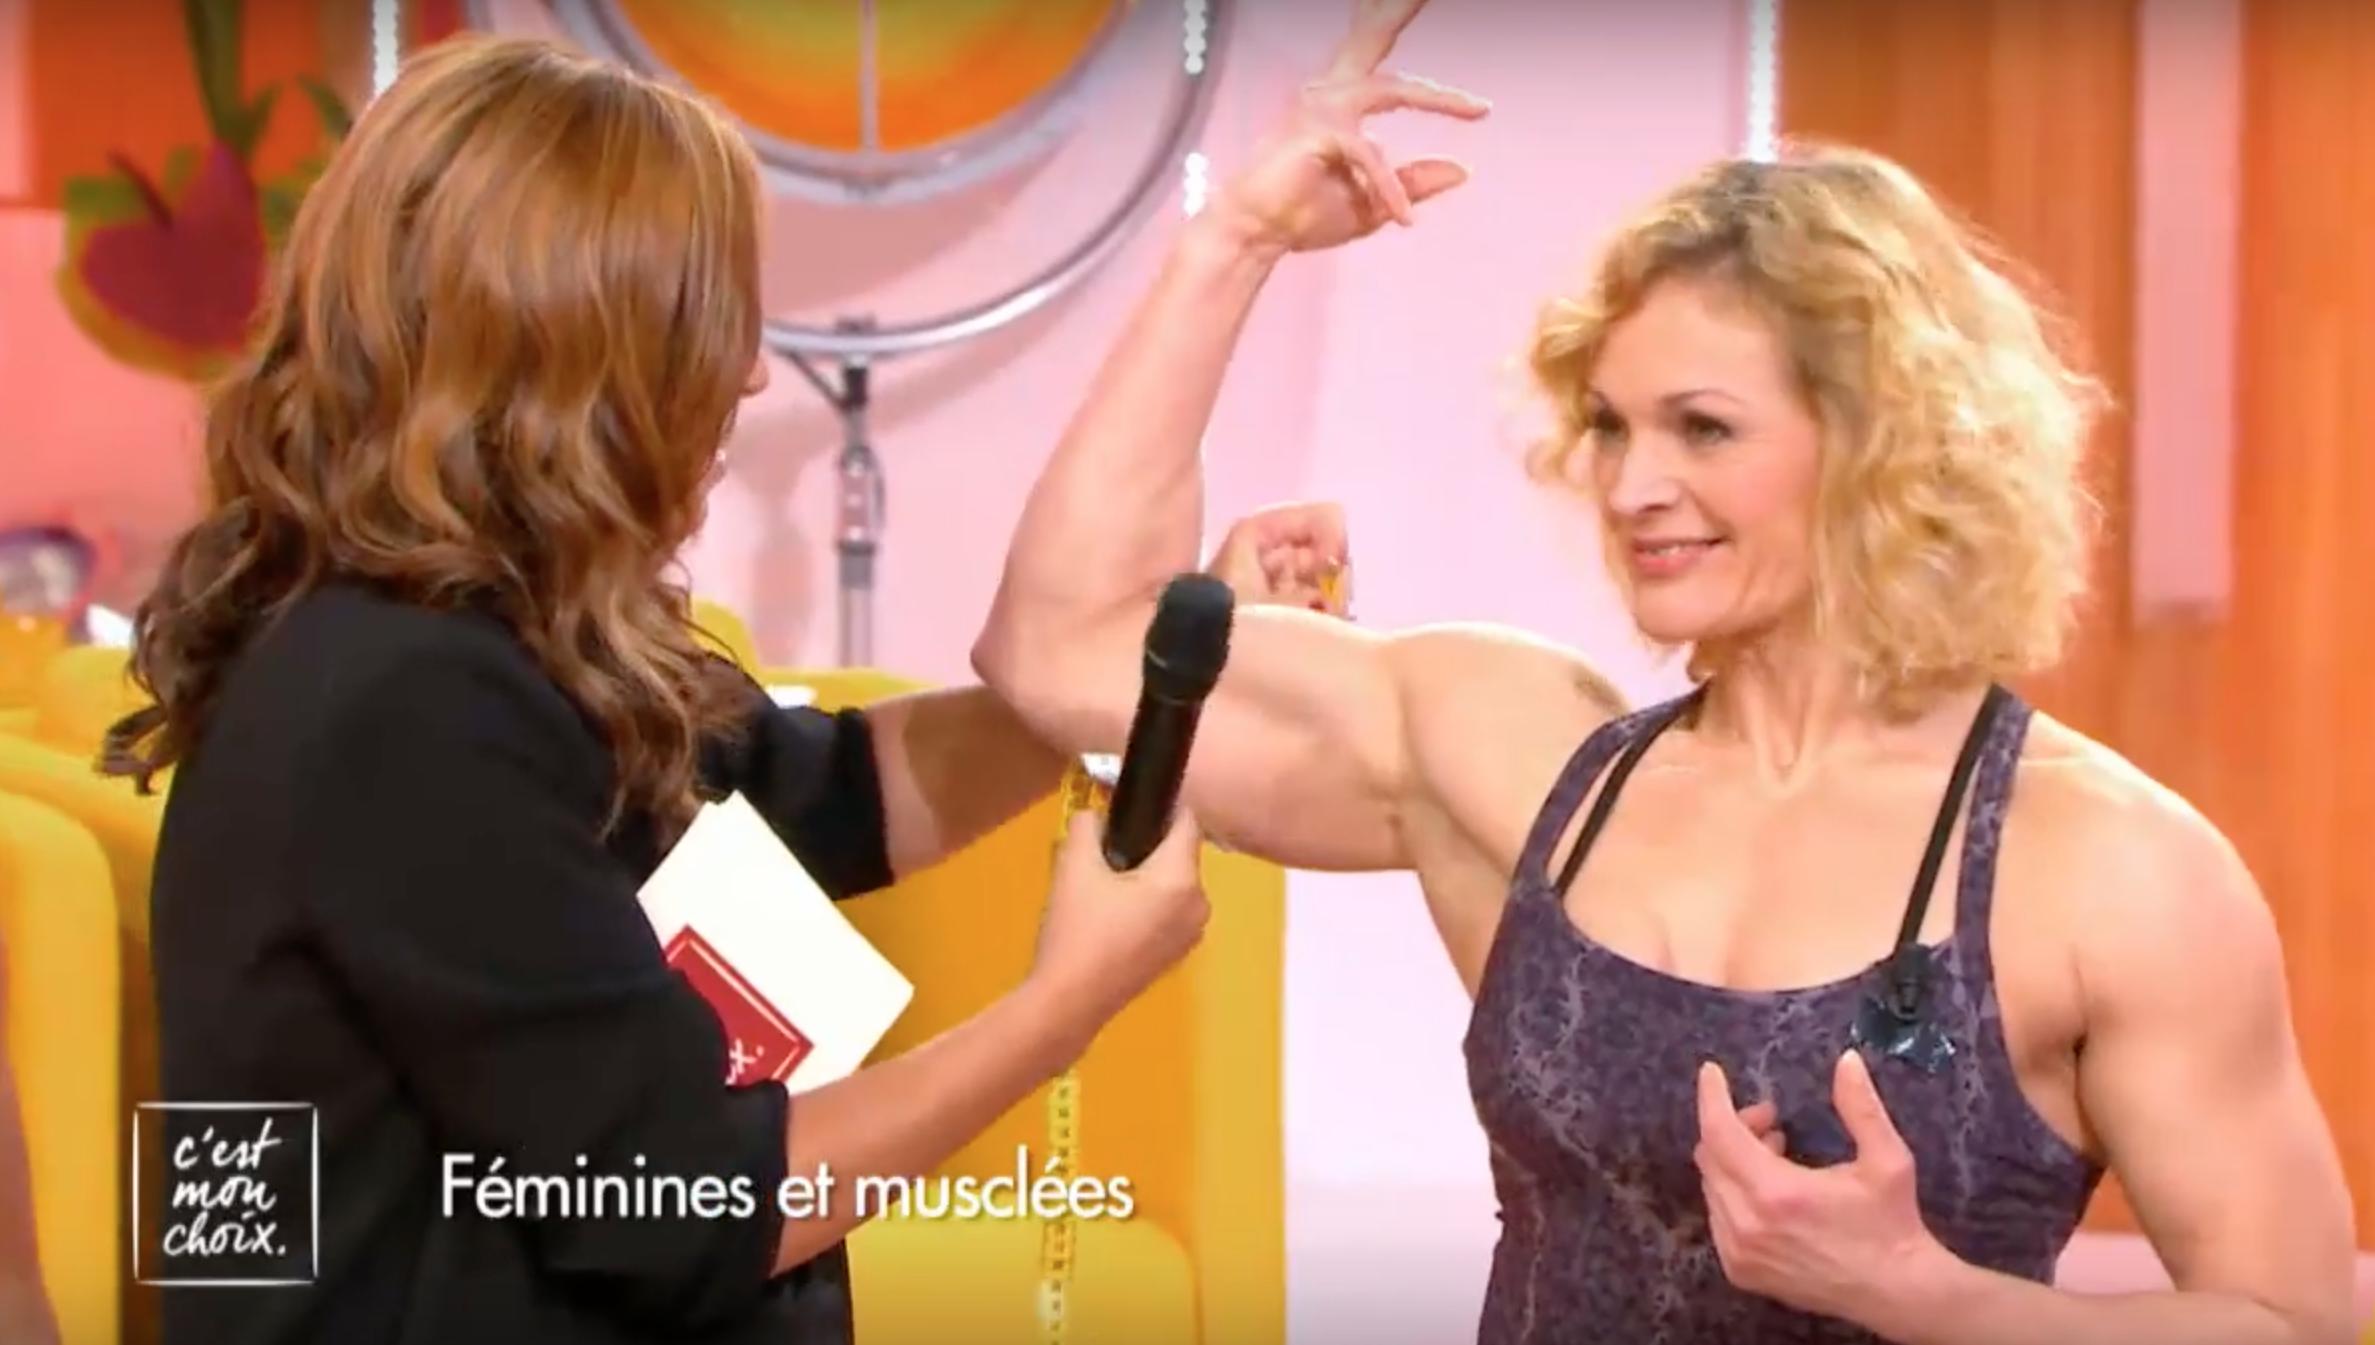 femme bodybuilder rencontre